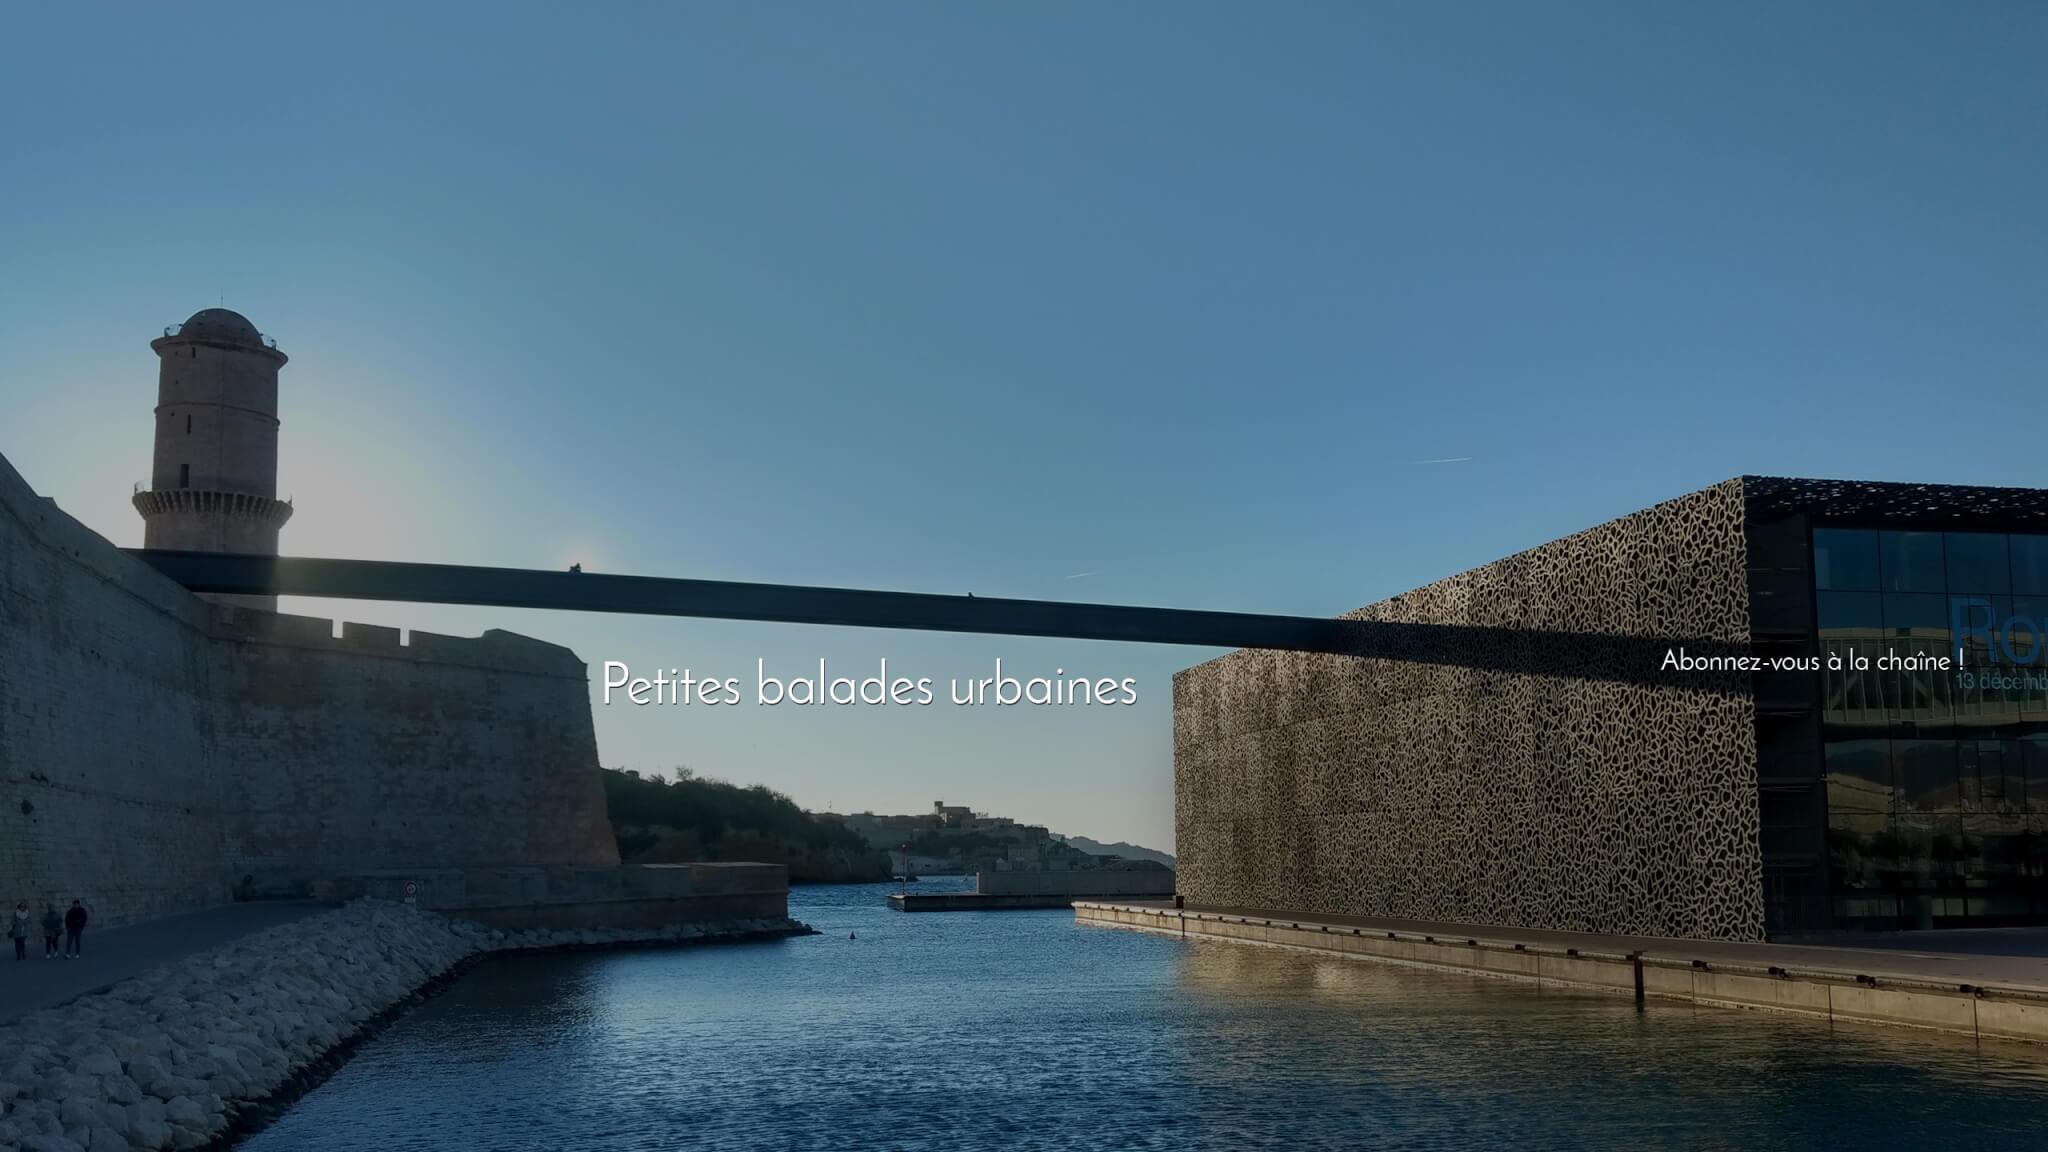 Les petites balades urbaines Banniere-youtube